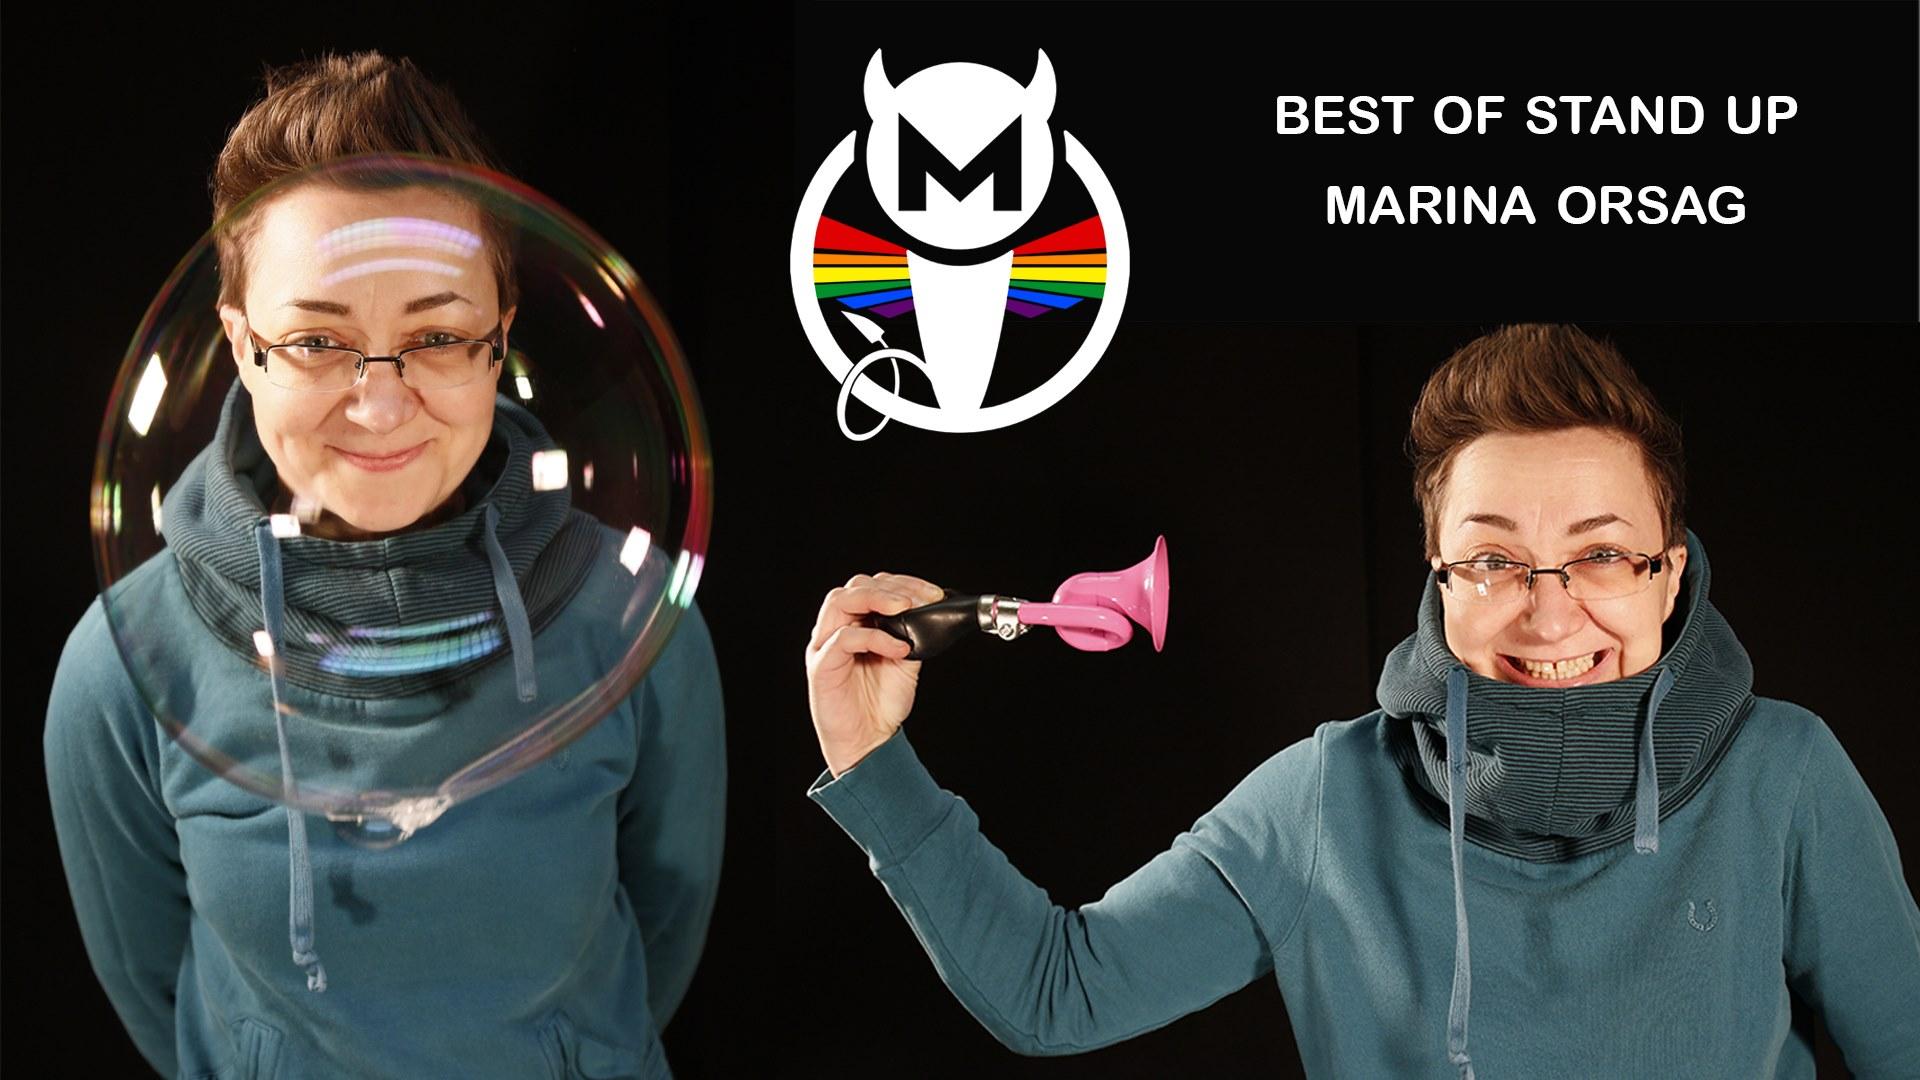 Ploče Best of stand up Marina Orsag